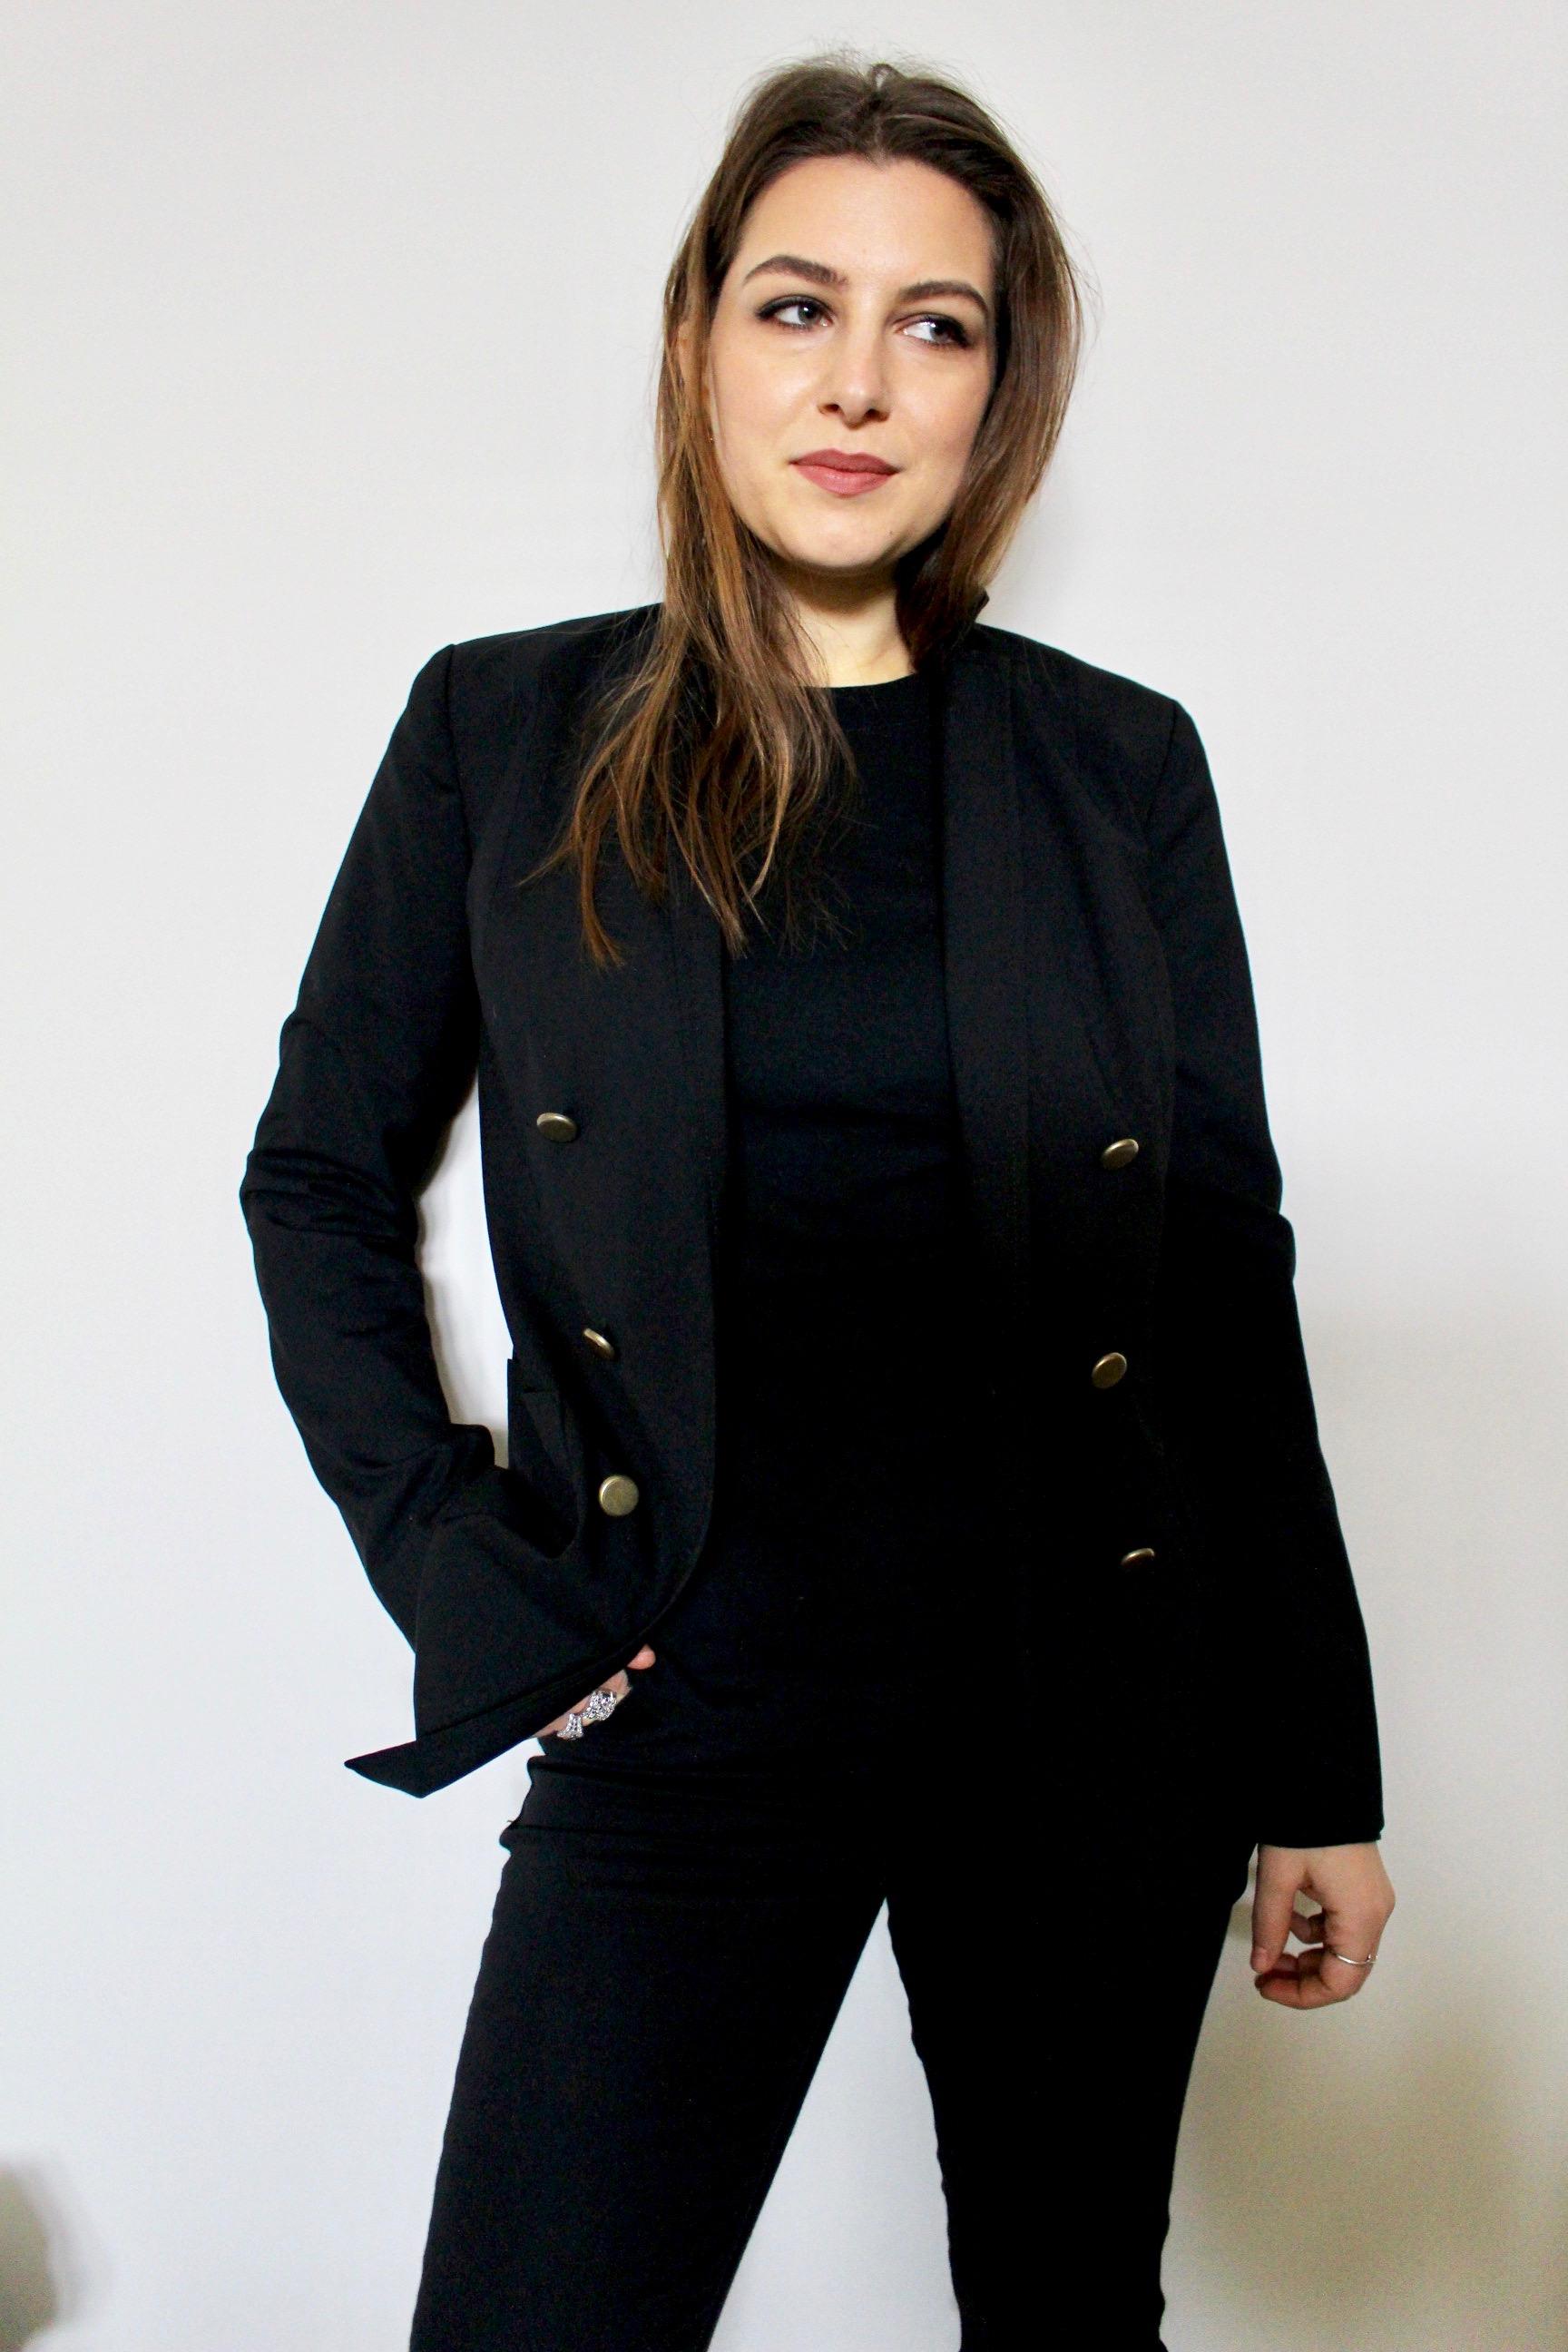 all black / self-imposed uniform / nicolemcaruso.com